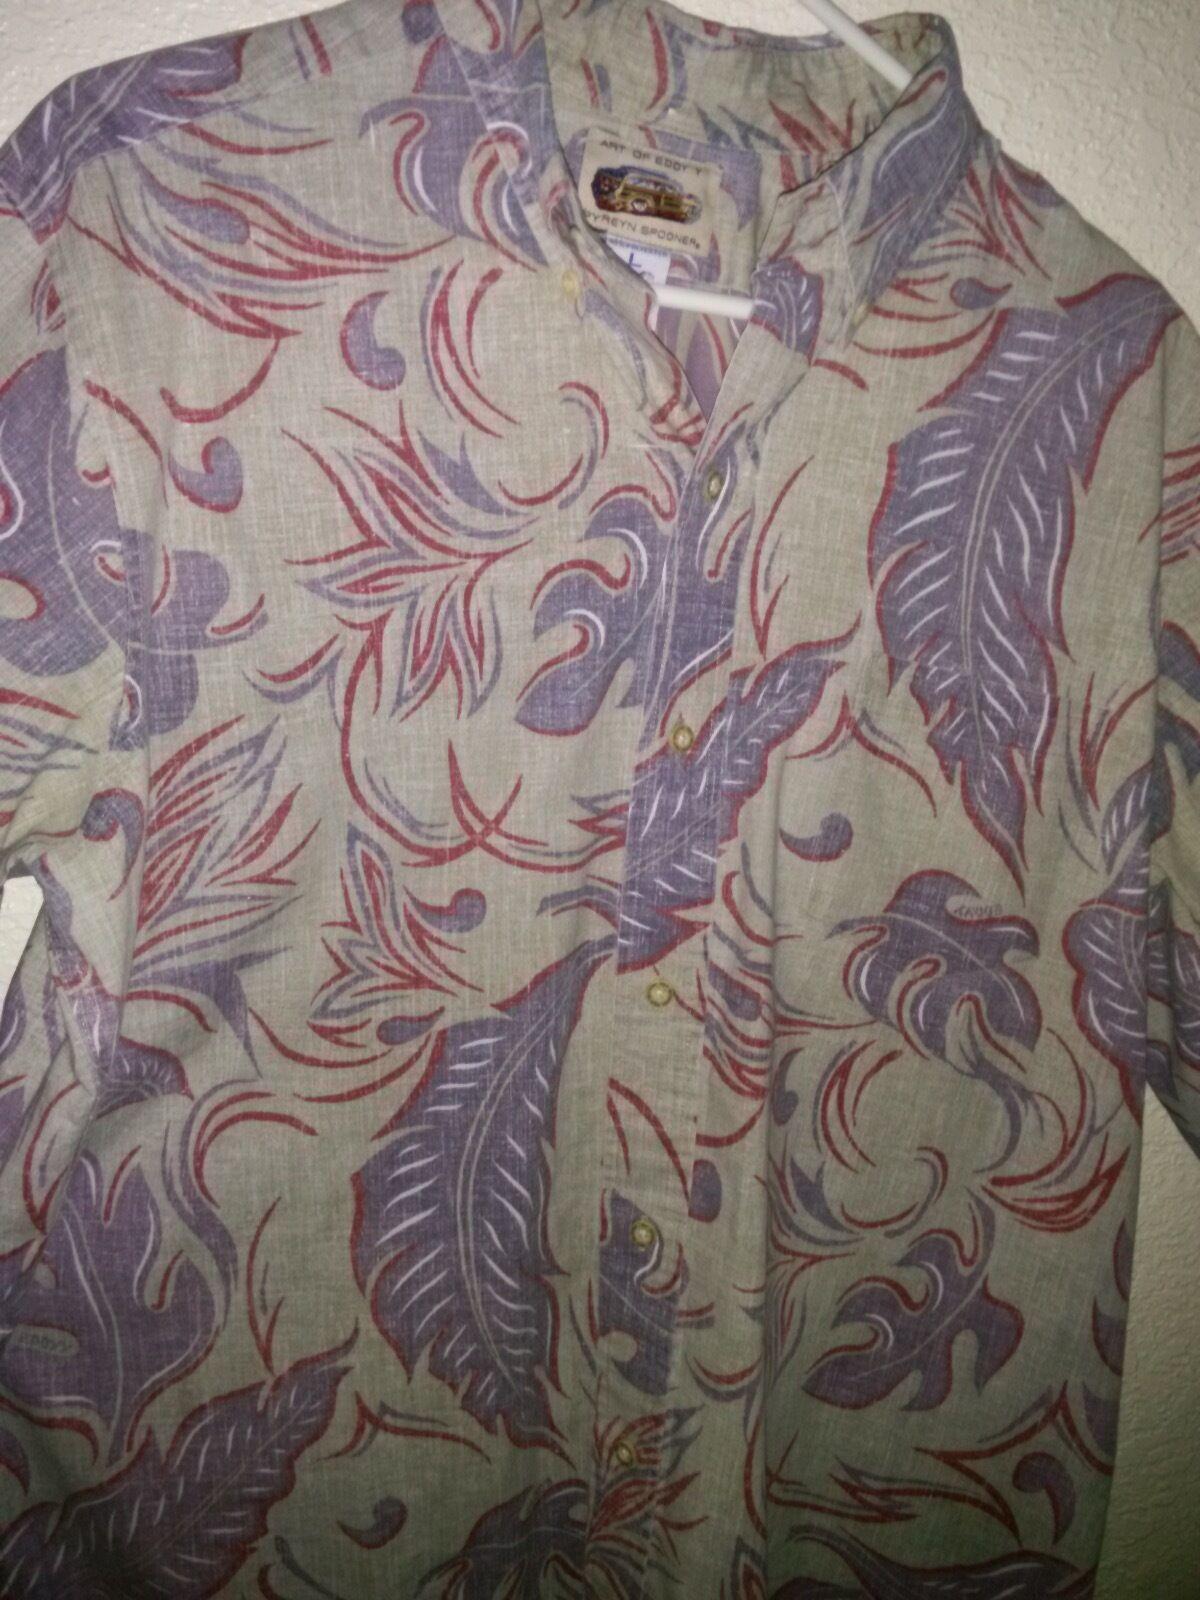 3db4ea72 Reyn Spooner ™ - 100% Cotton Camp Shirt Art of Eddy Y L P2P EUC 24.5